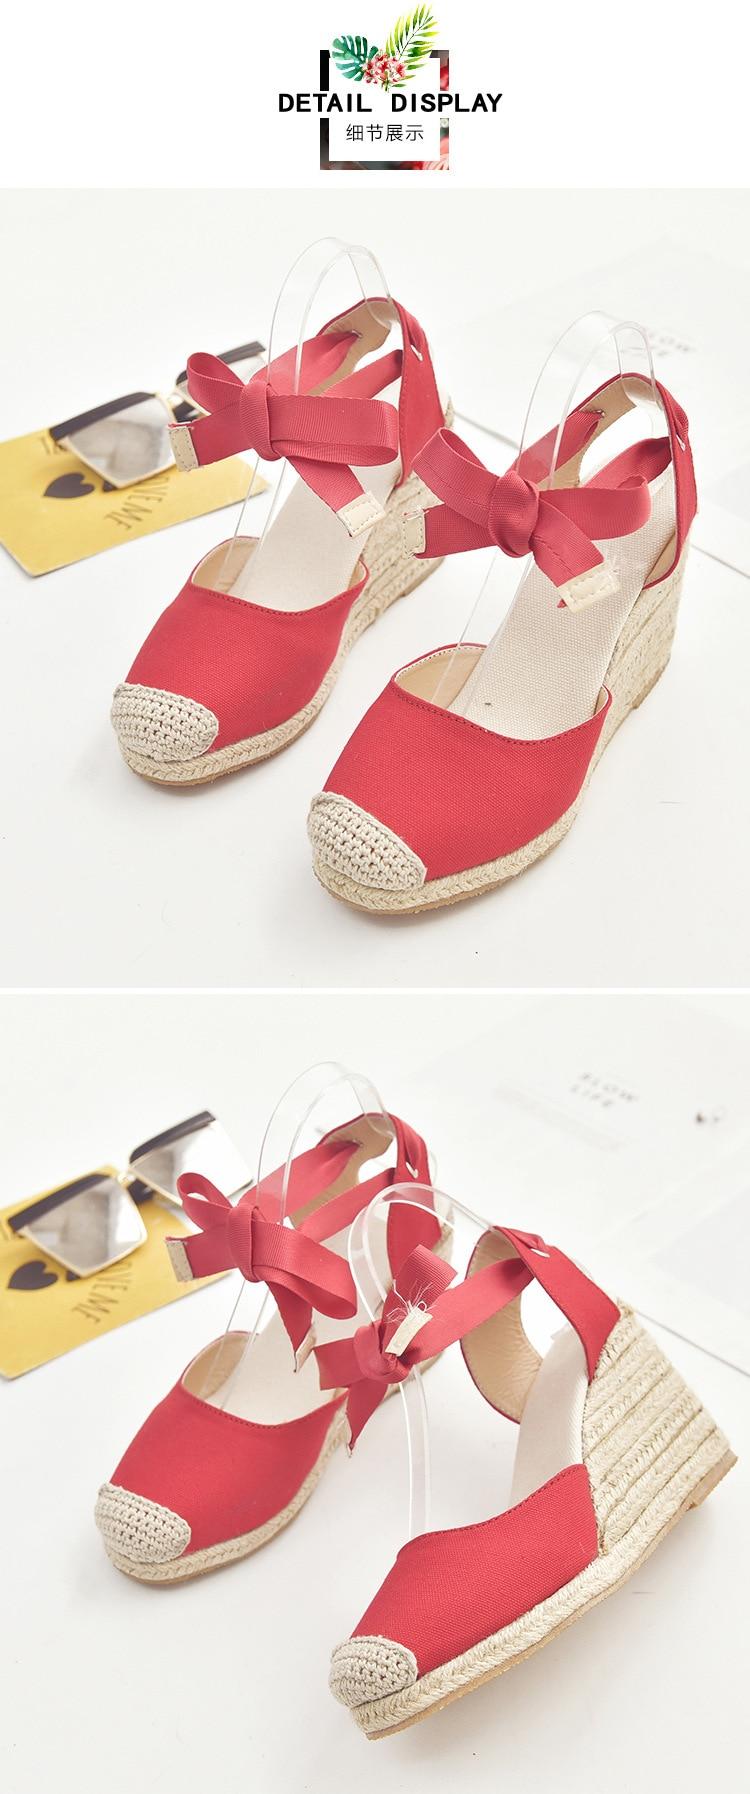 HTB1AM YajnuK1RkSmFPq6AuzFXaW Women's Espadrille Ankle Strap Sandals Comfortable Slippers Ladies Womens Casual Shoes Breathable Flax Hemp Canvas Pumps